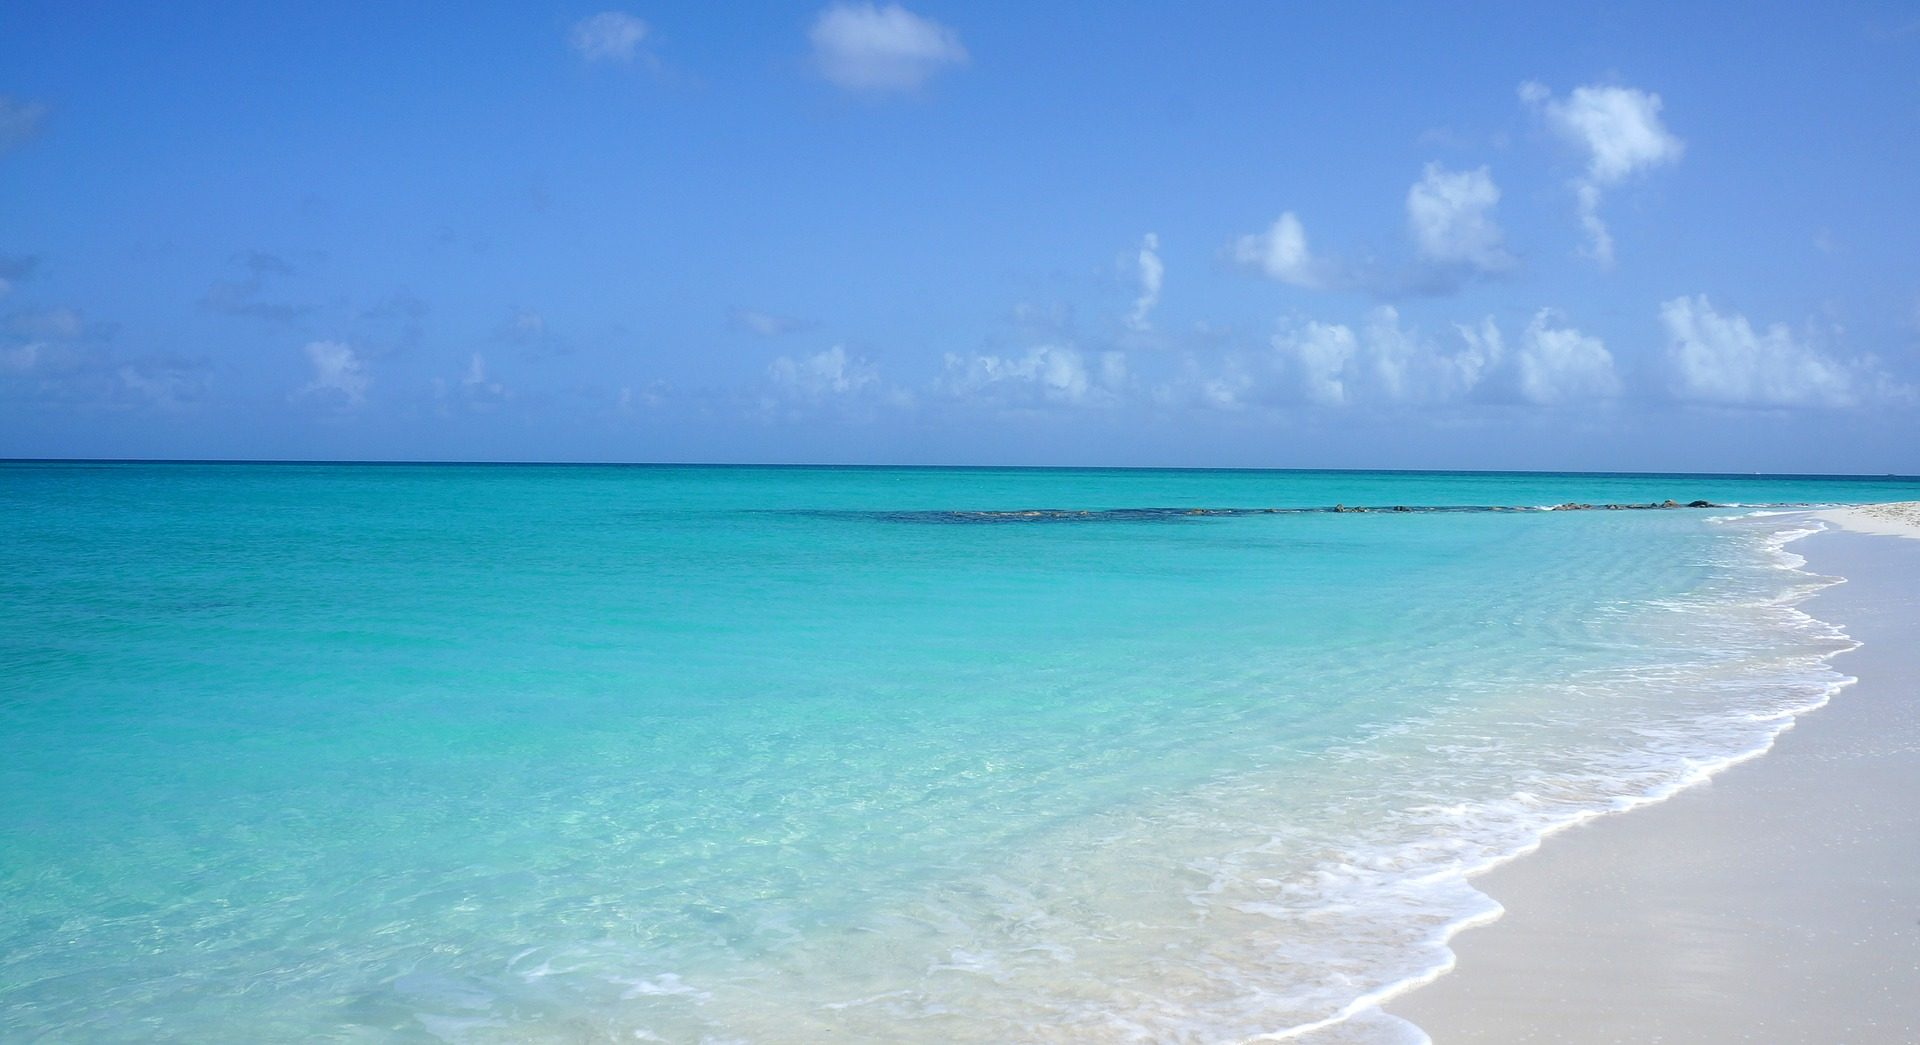 समुद्र तट, मरकत, आकाश, बादल, आराम, टैपवार्म - HD वॉलपेपर - प्रोफेसर-falken.com